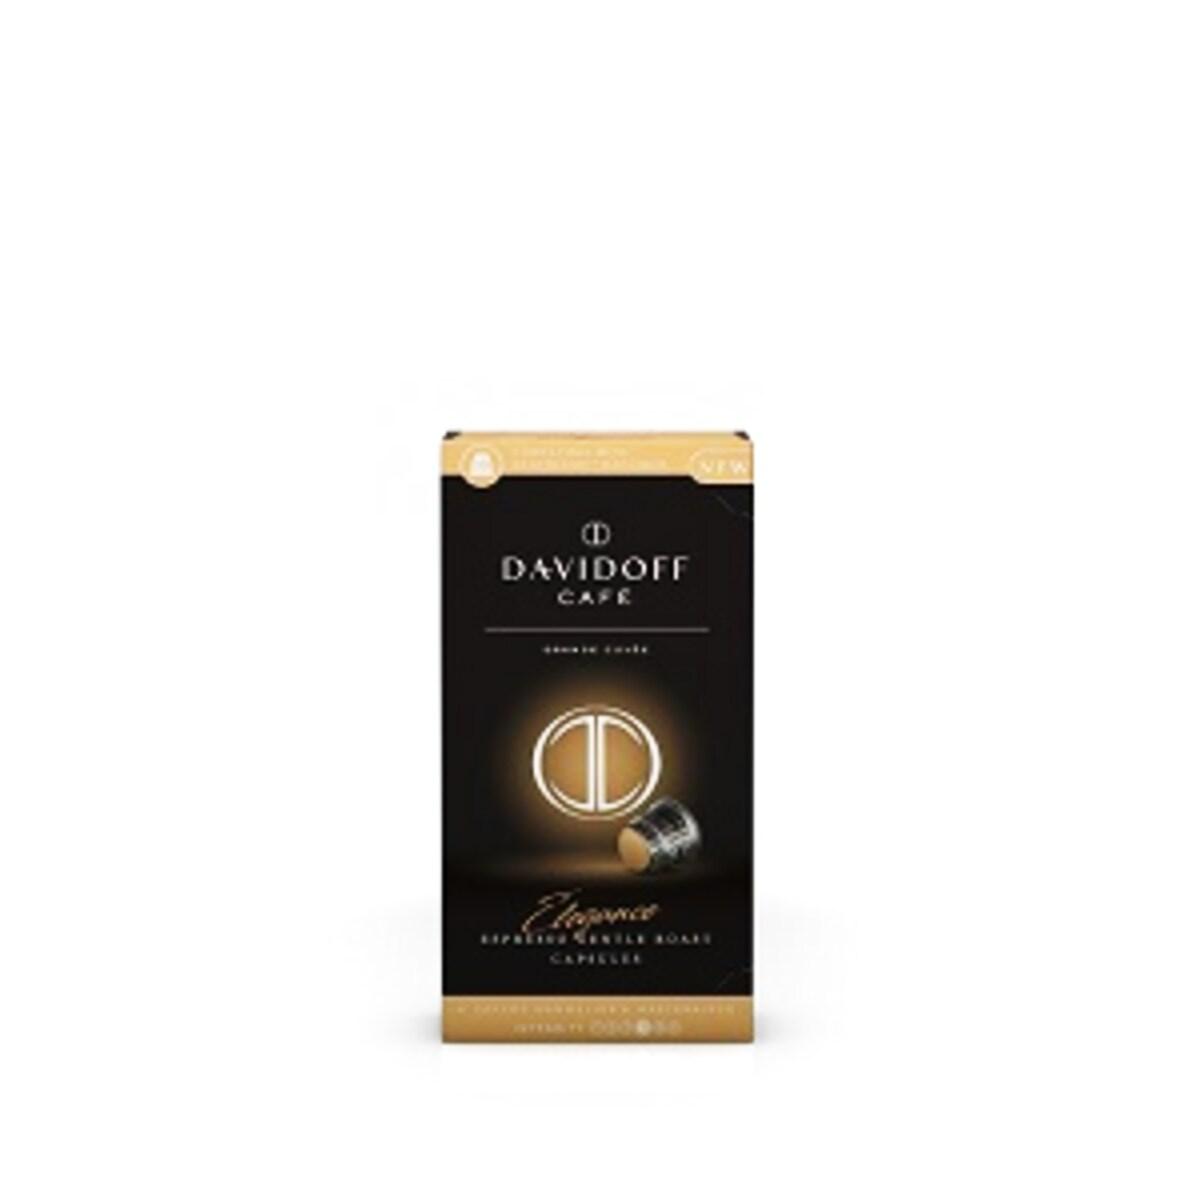 Davidoff Cafe Elegance - Nespresso συμβατές κάψουλες